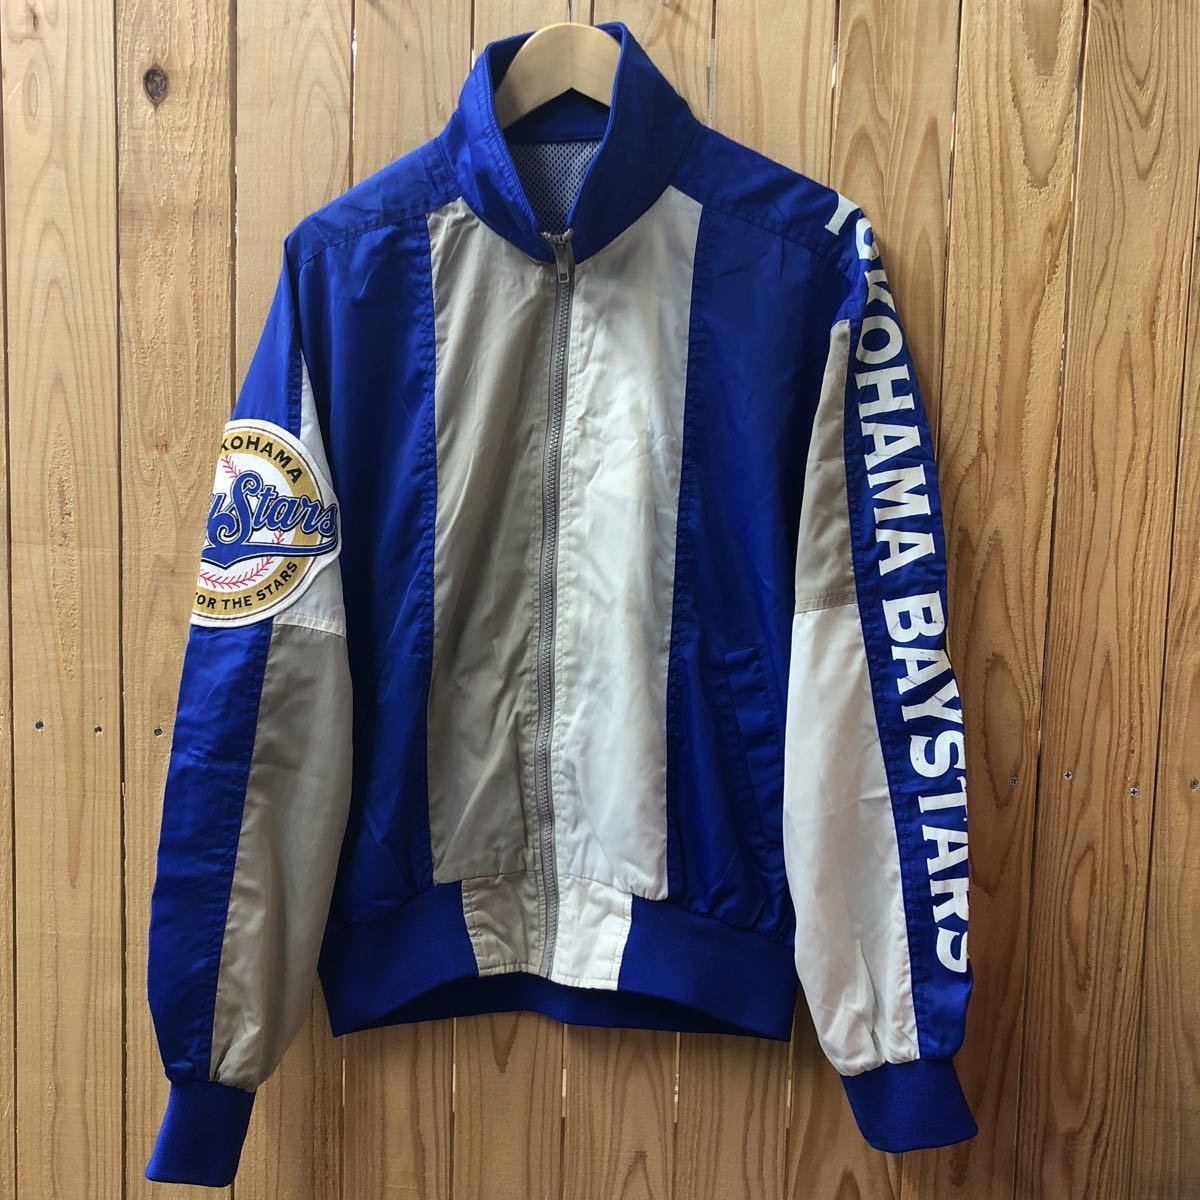 a19a5fe5df2b6 横浜ベイスターズ ジャンパー ウインドブレーカー ジャケット 袖ロゴ ワッペン ナイロン プロ野球 応援 スポーツウェア アウター